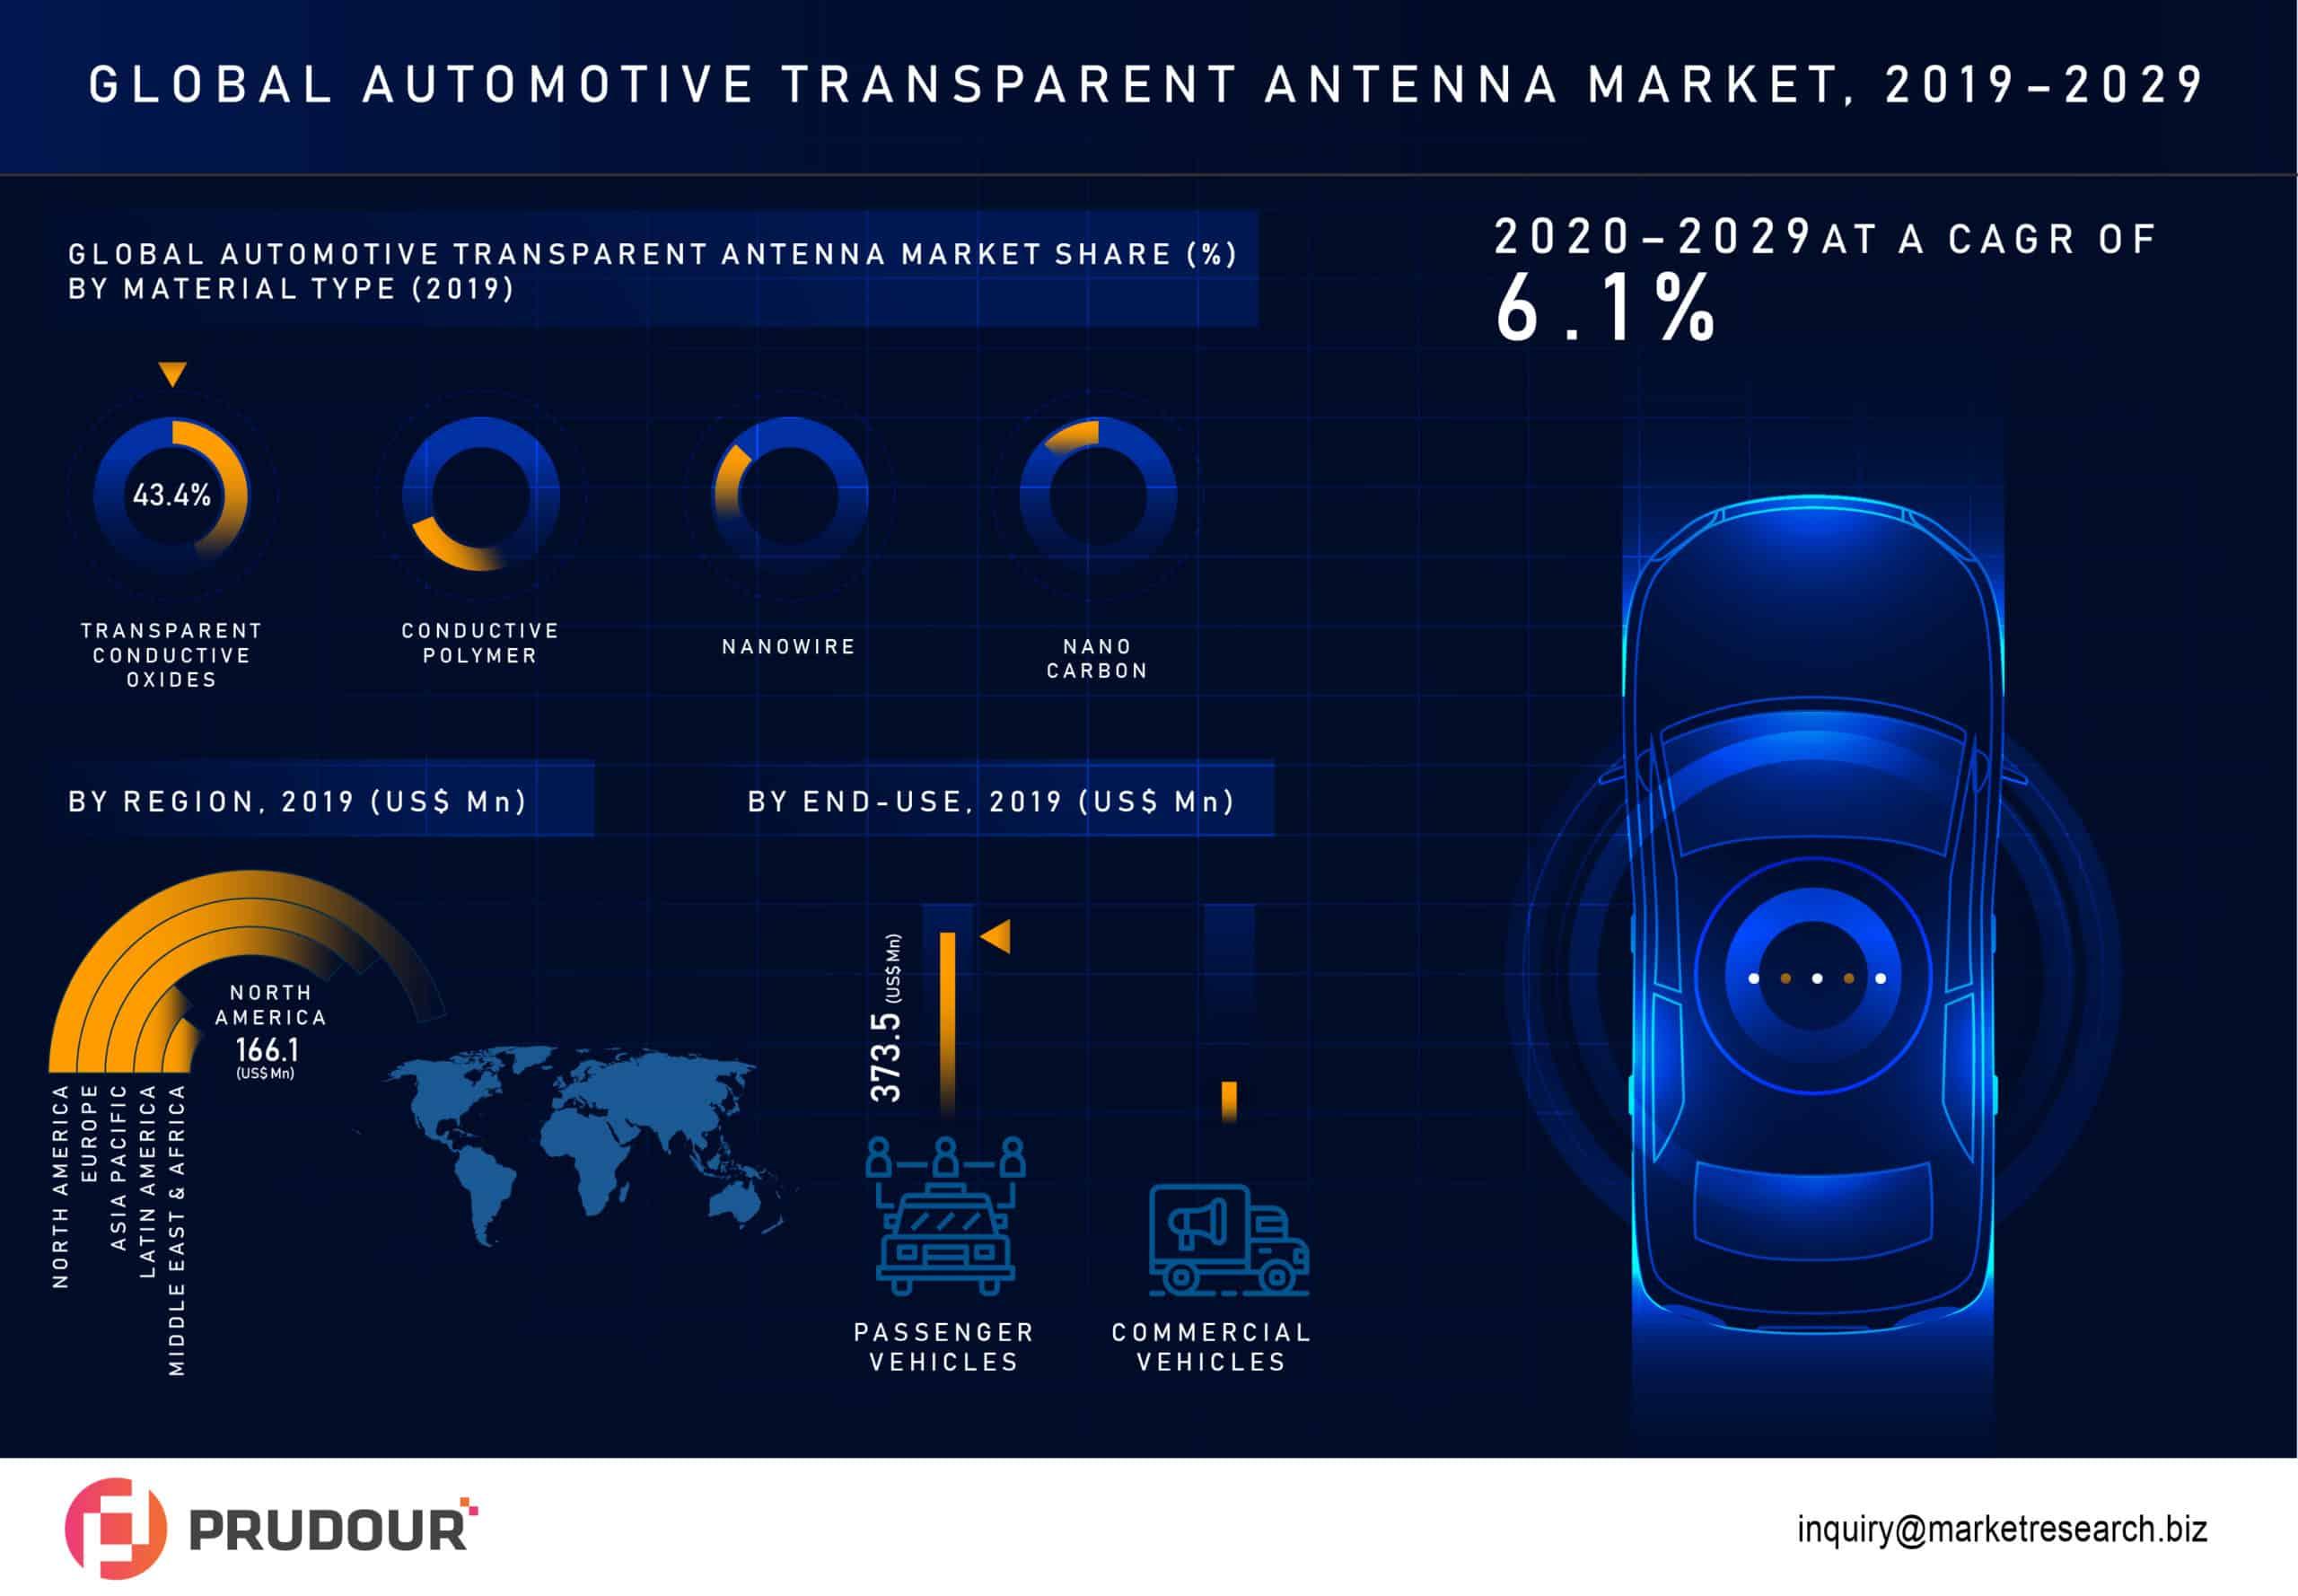 Automotive Transparent Antenna Market